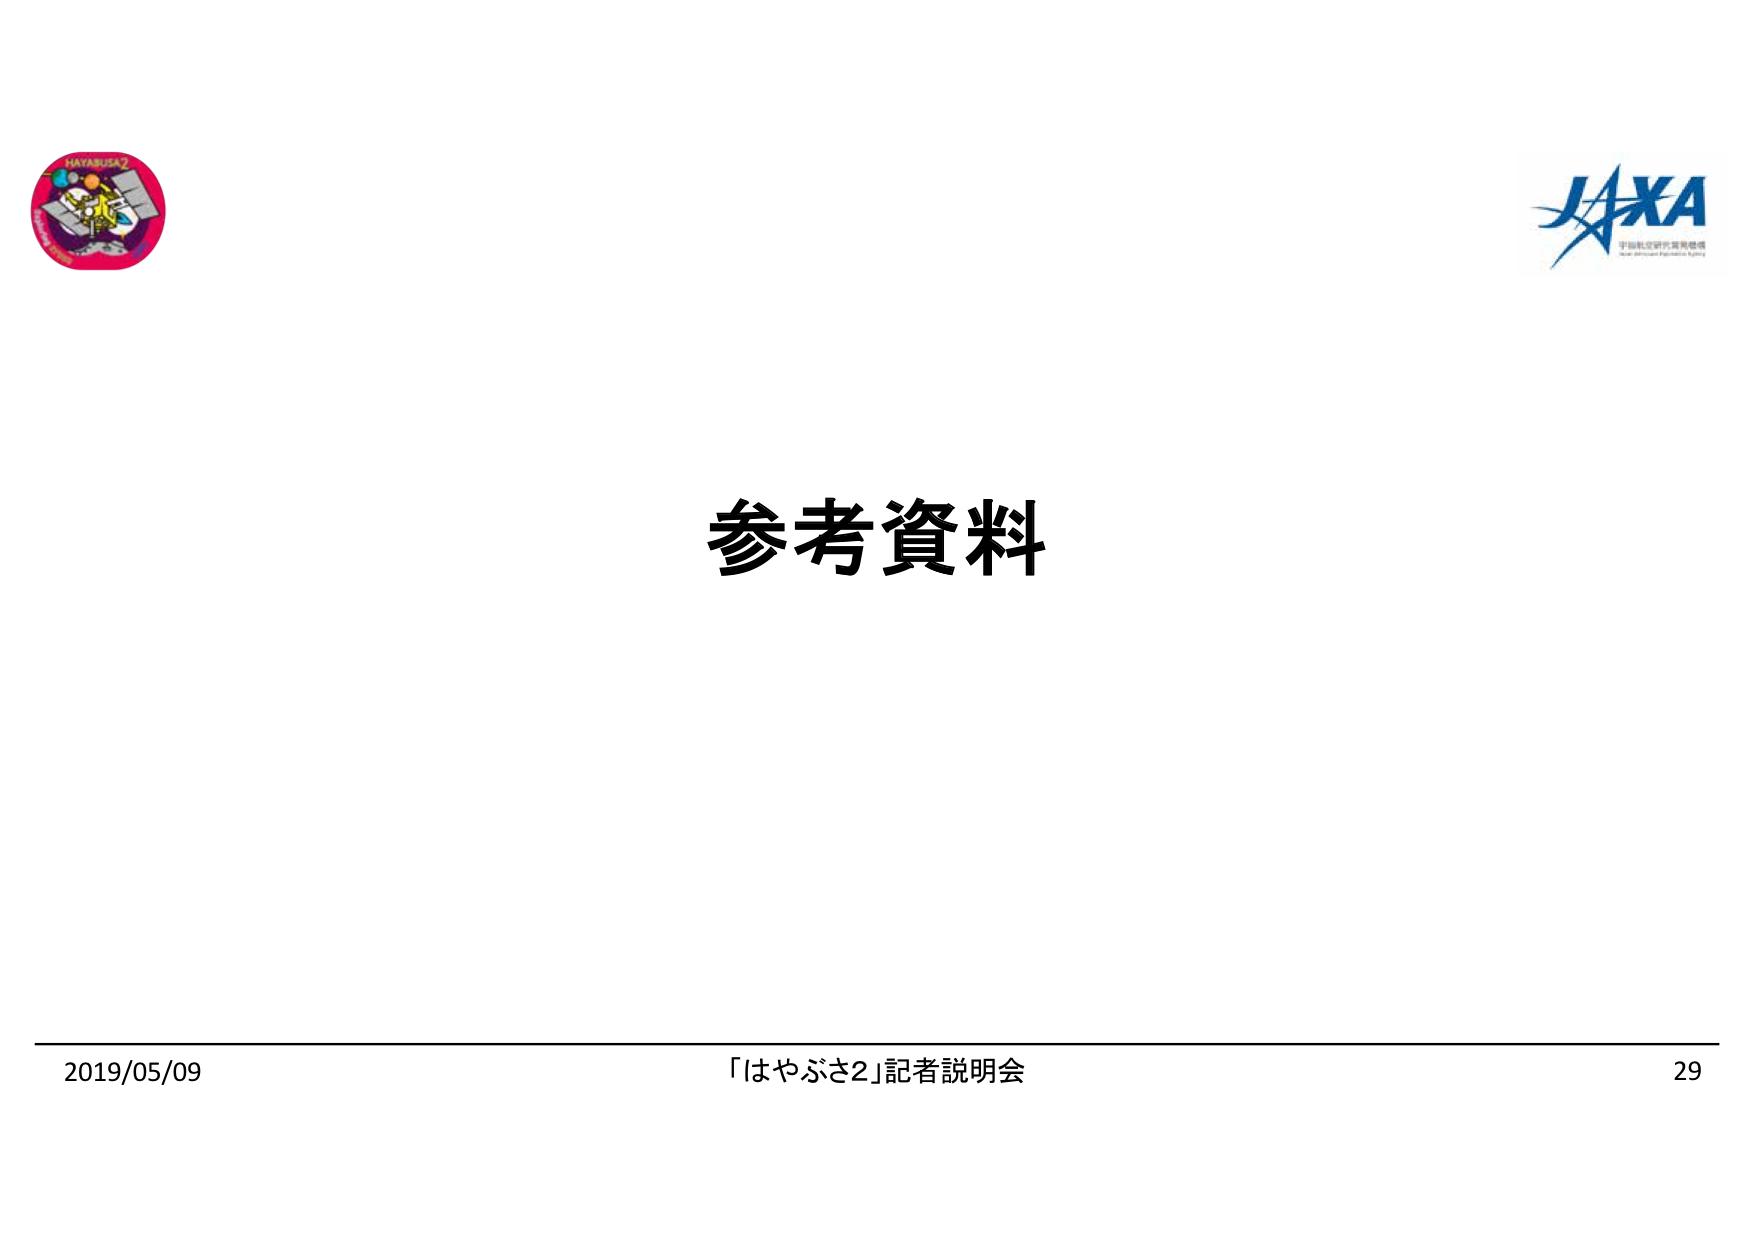 f:id:Imamura:20190509154425p:plain